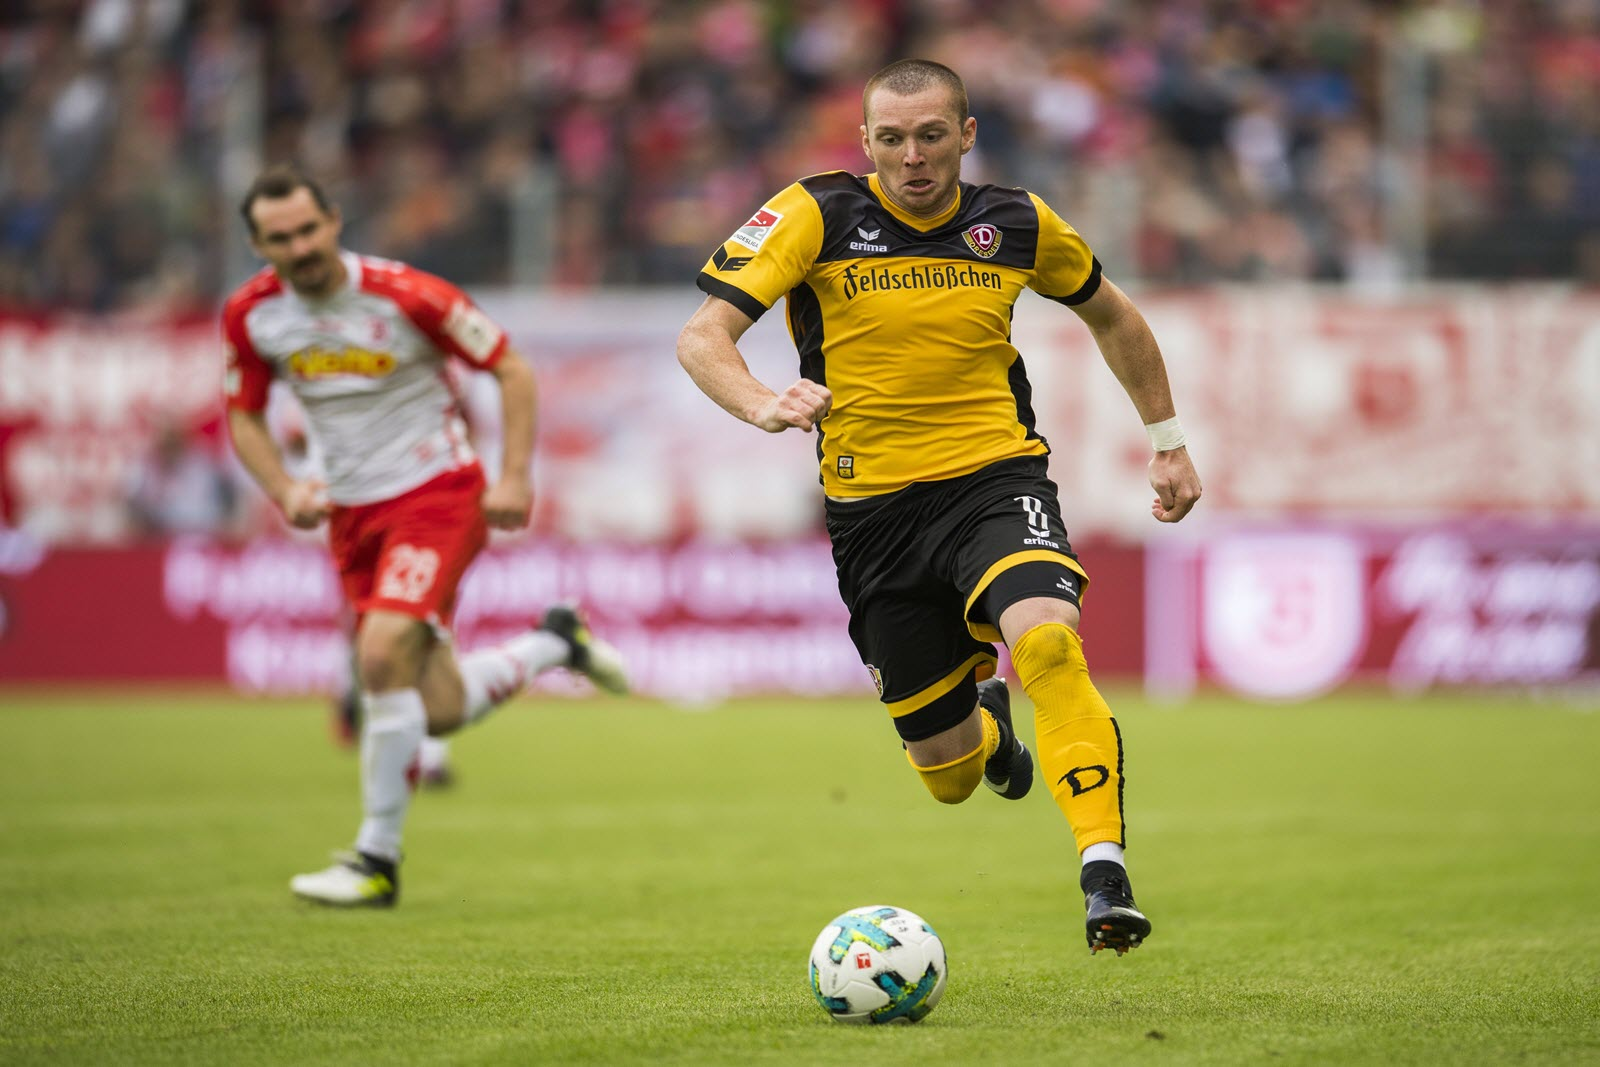 Haris Duljevic im Trikot von Dynamo Dresden